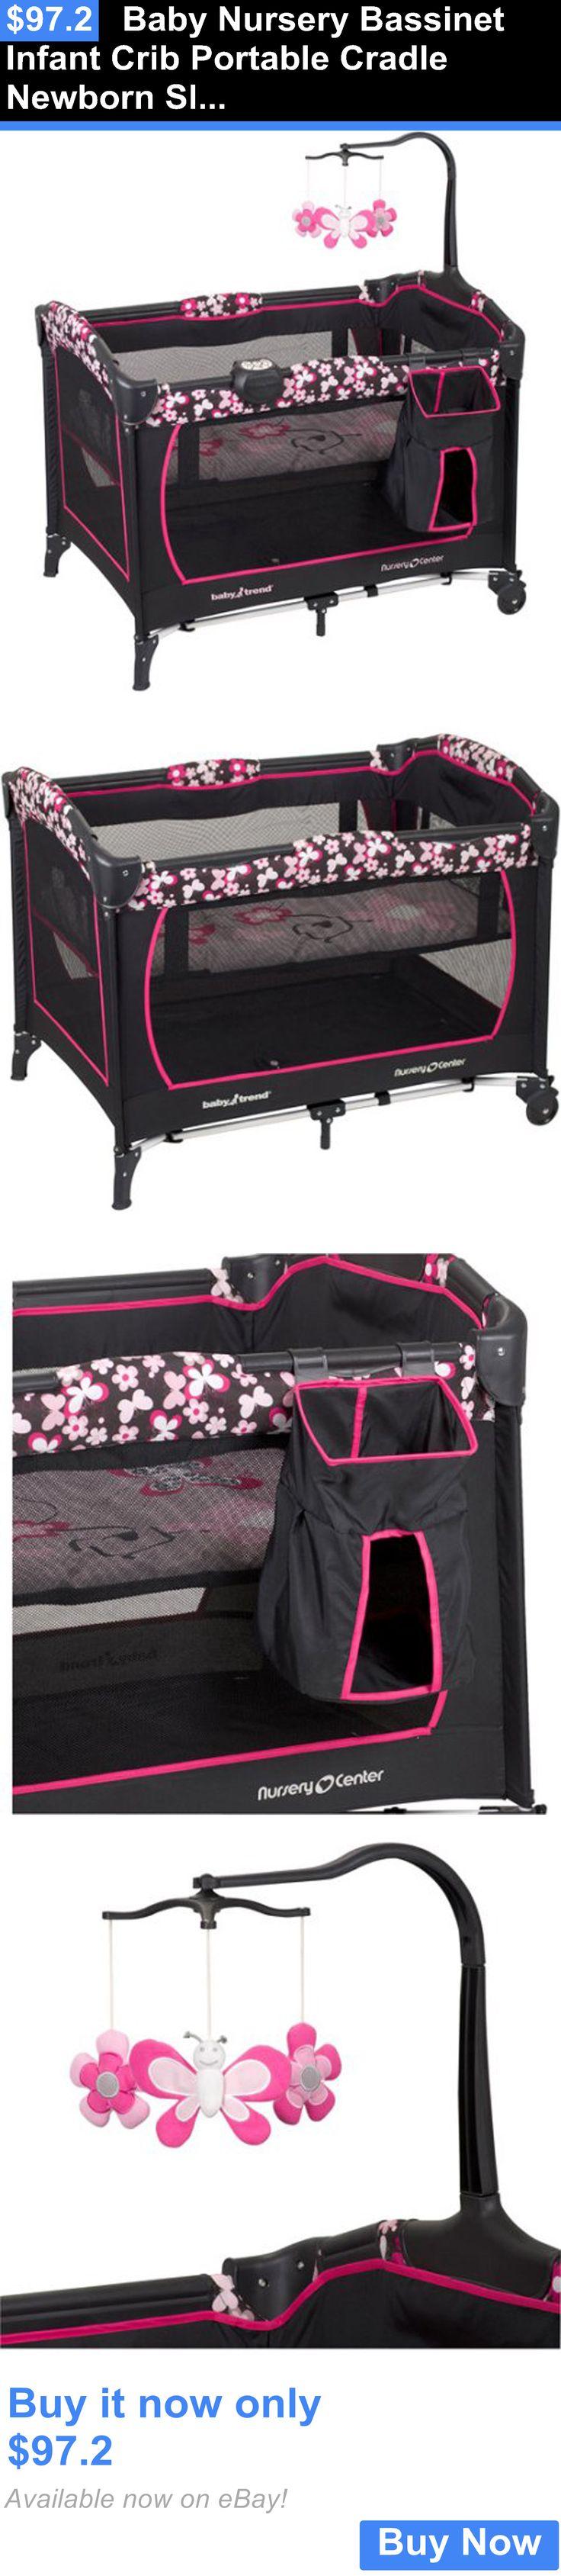 Baby cribs staten island - Baby Nursery Baby Nursery Bassinet Infant Crib Portable Cradle Newborn Sleeper Bed Furniture Buy It